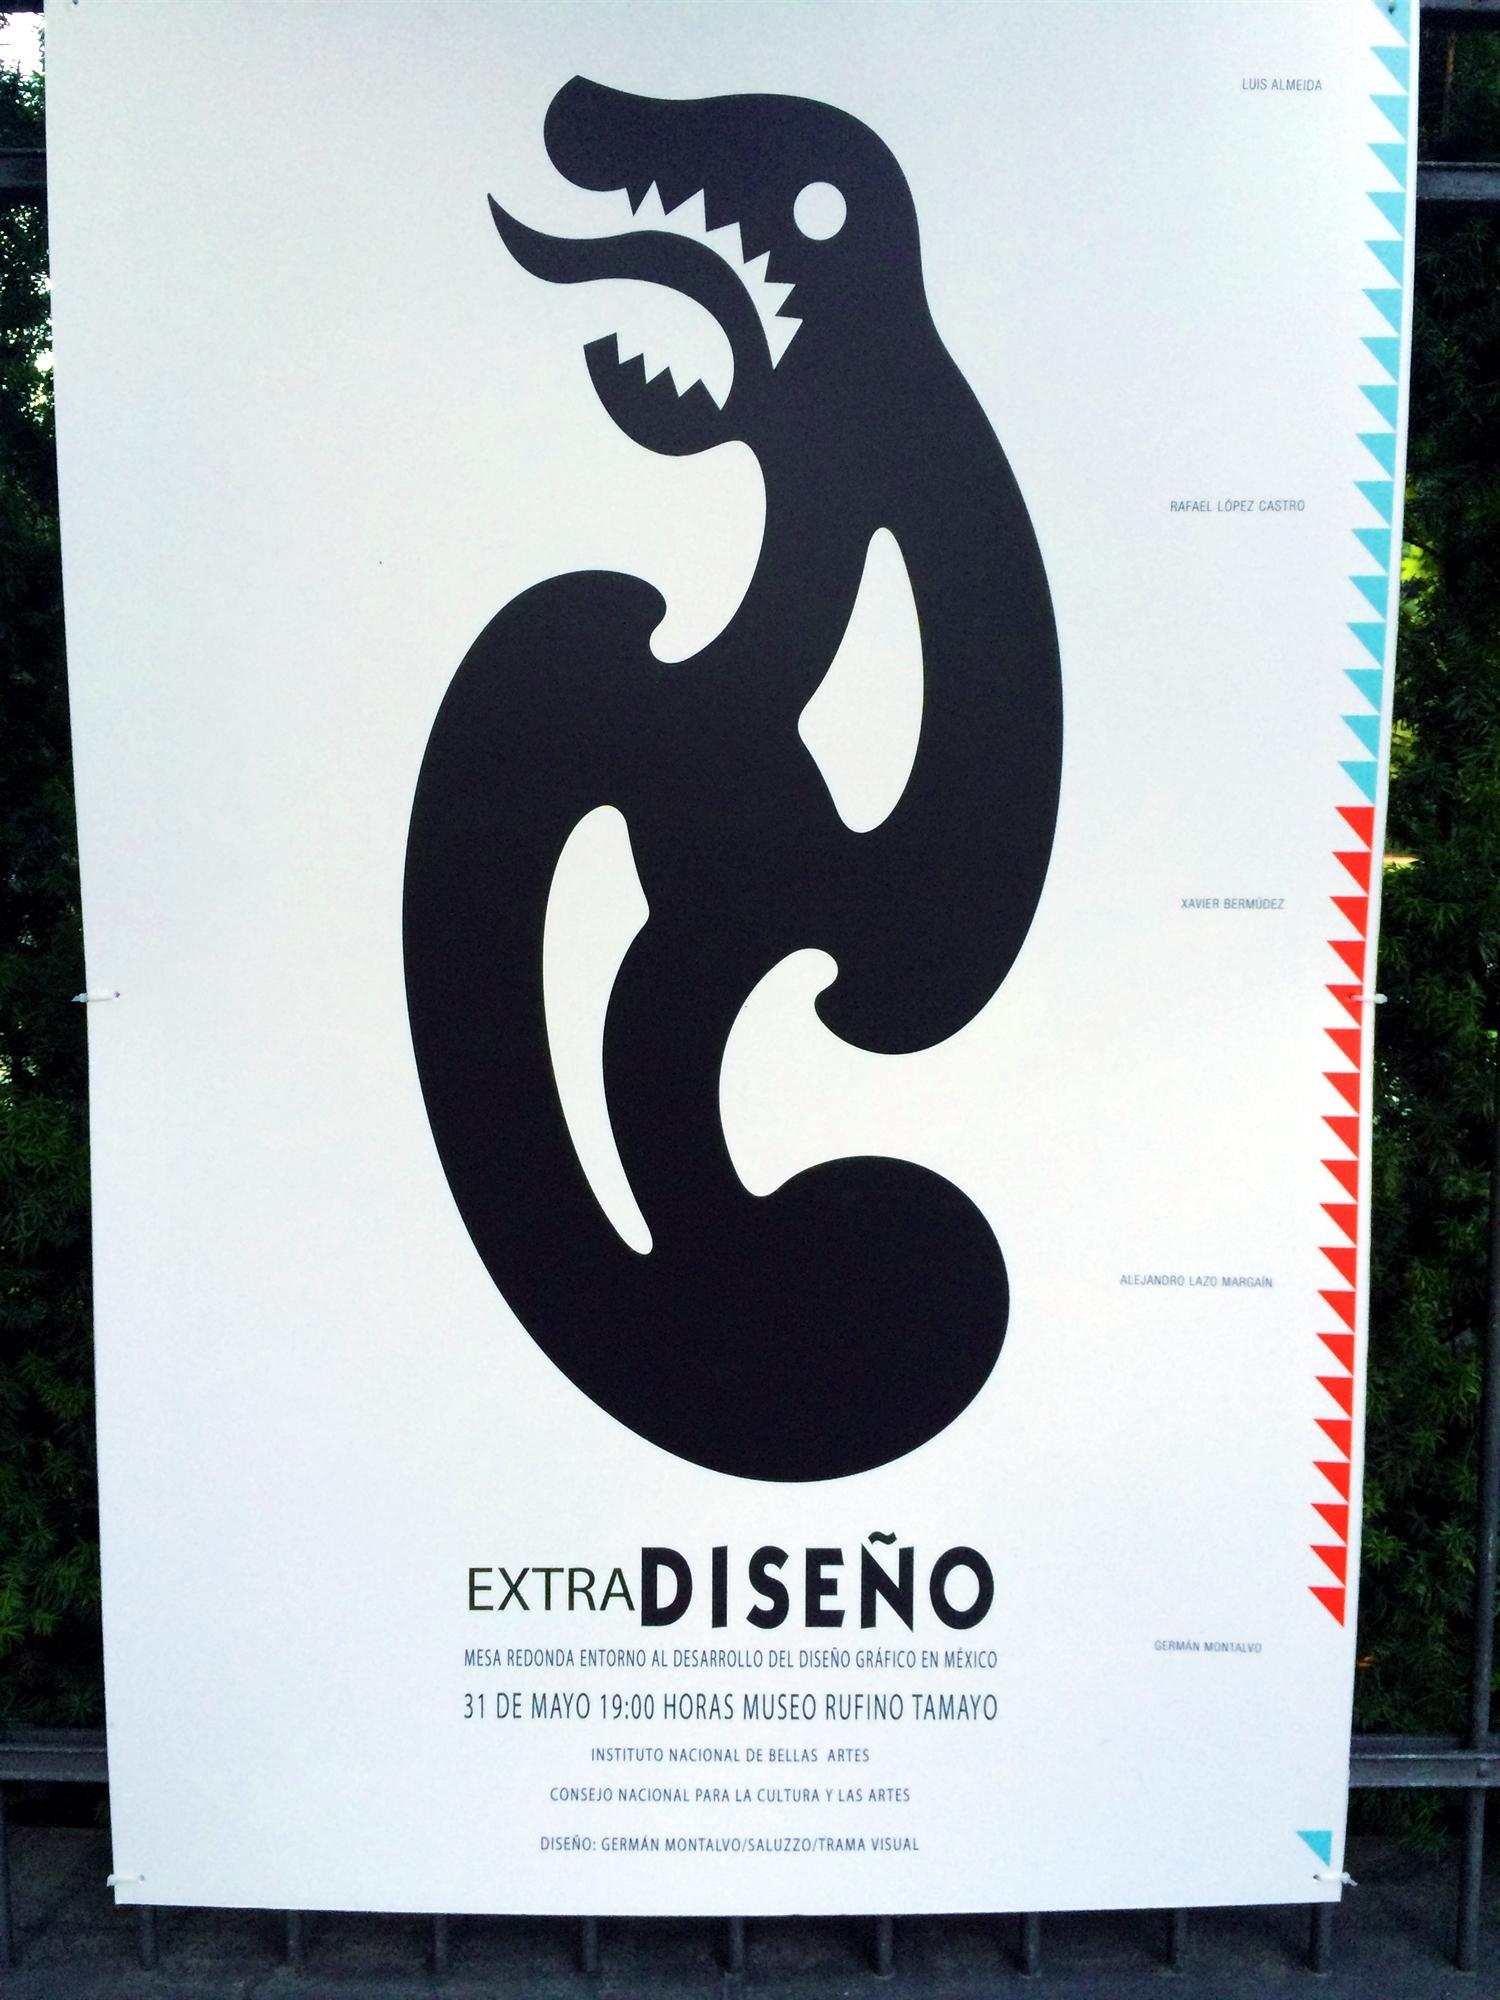 34 Mexican poster street art design plakat meksykanski projektowanie uzytkowe sztuka uliczna FORelementspl